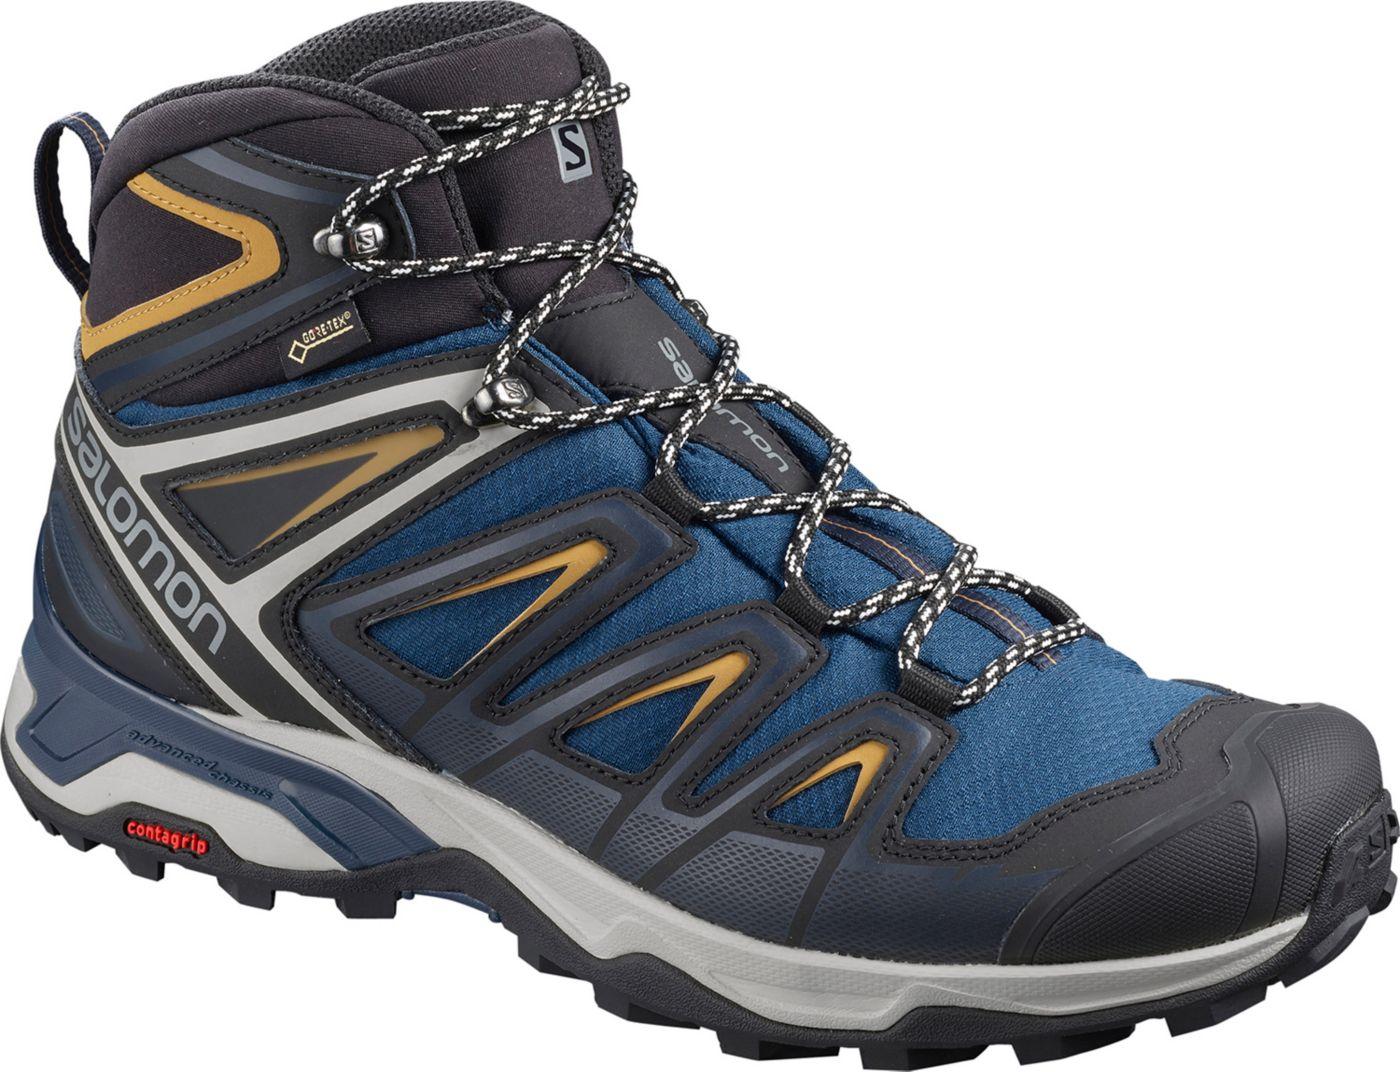 Salomon Men's X Ultra 3 Mid GTX Waterproof Hiking Boots